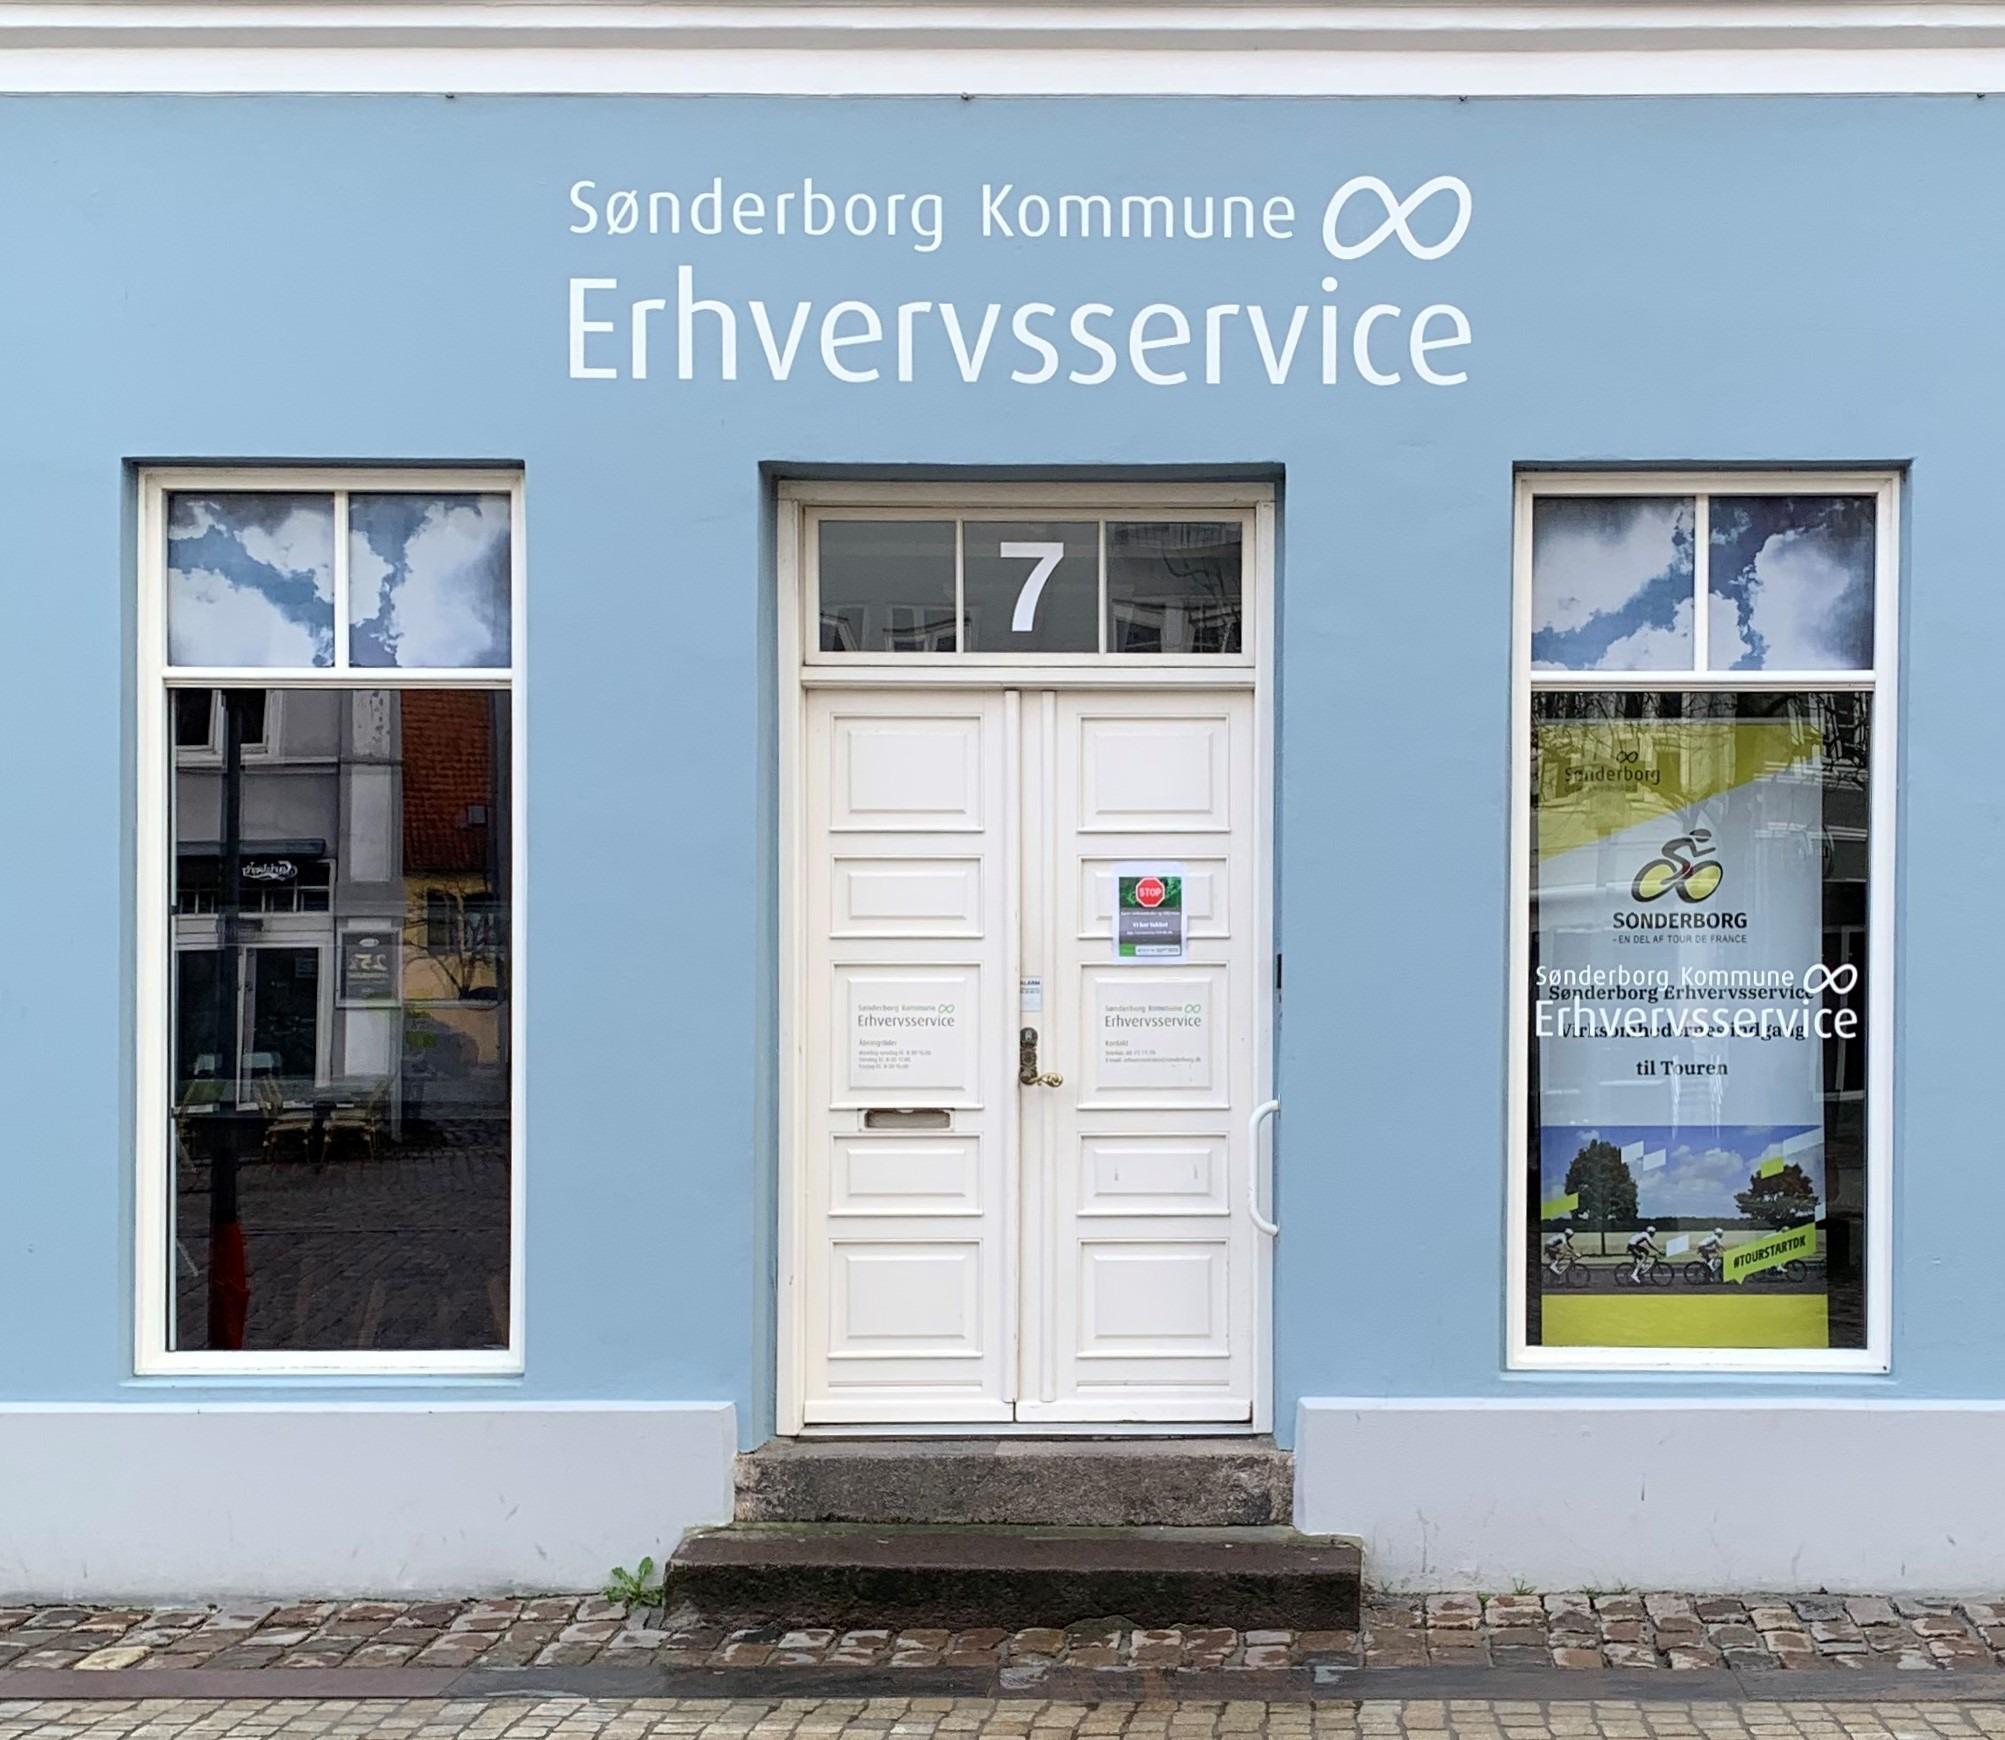 Mennesker på café i Sønderborg